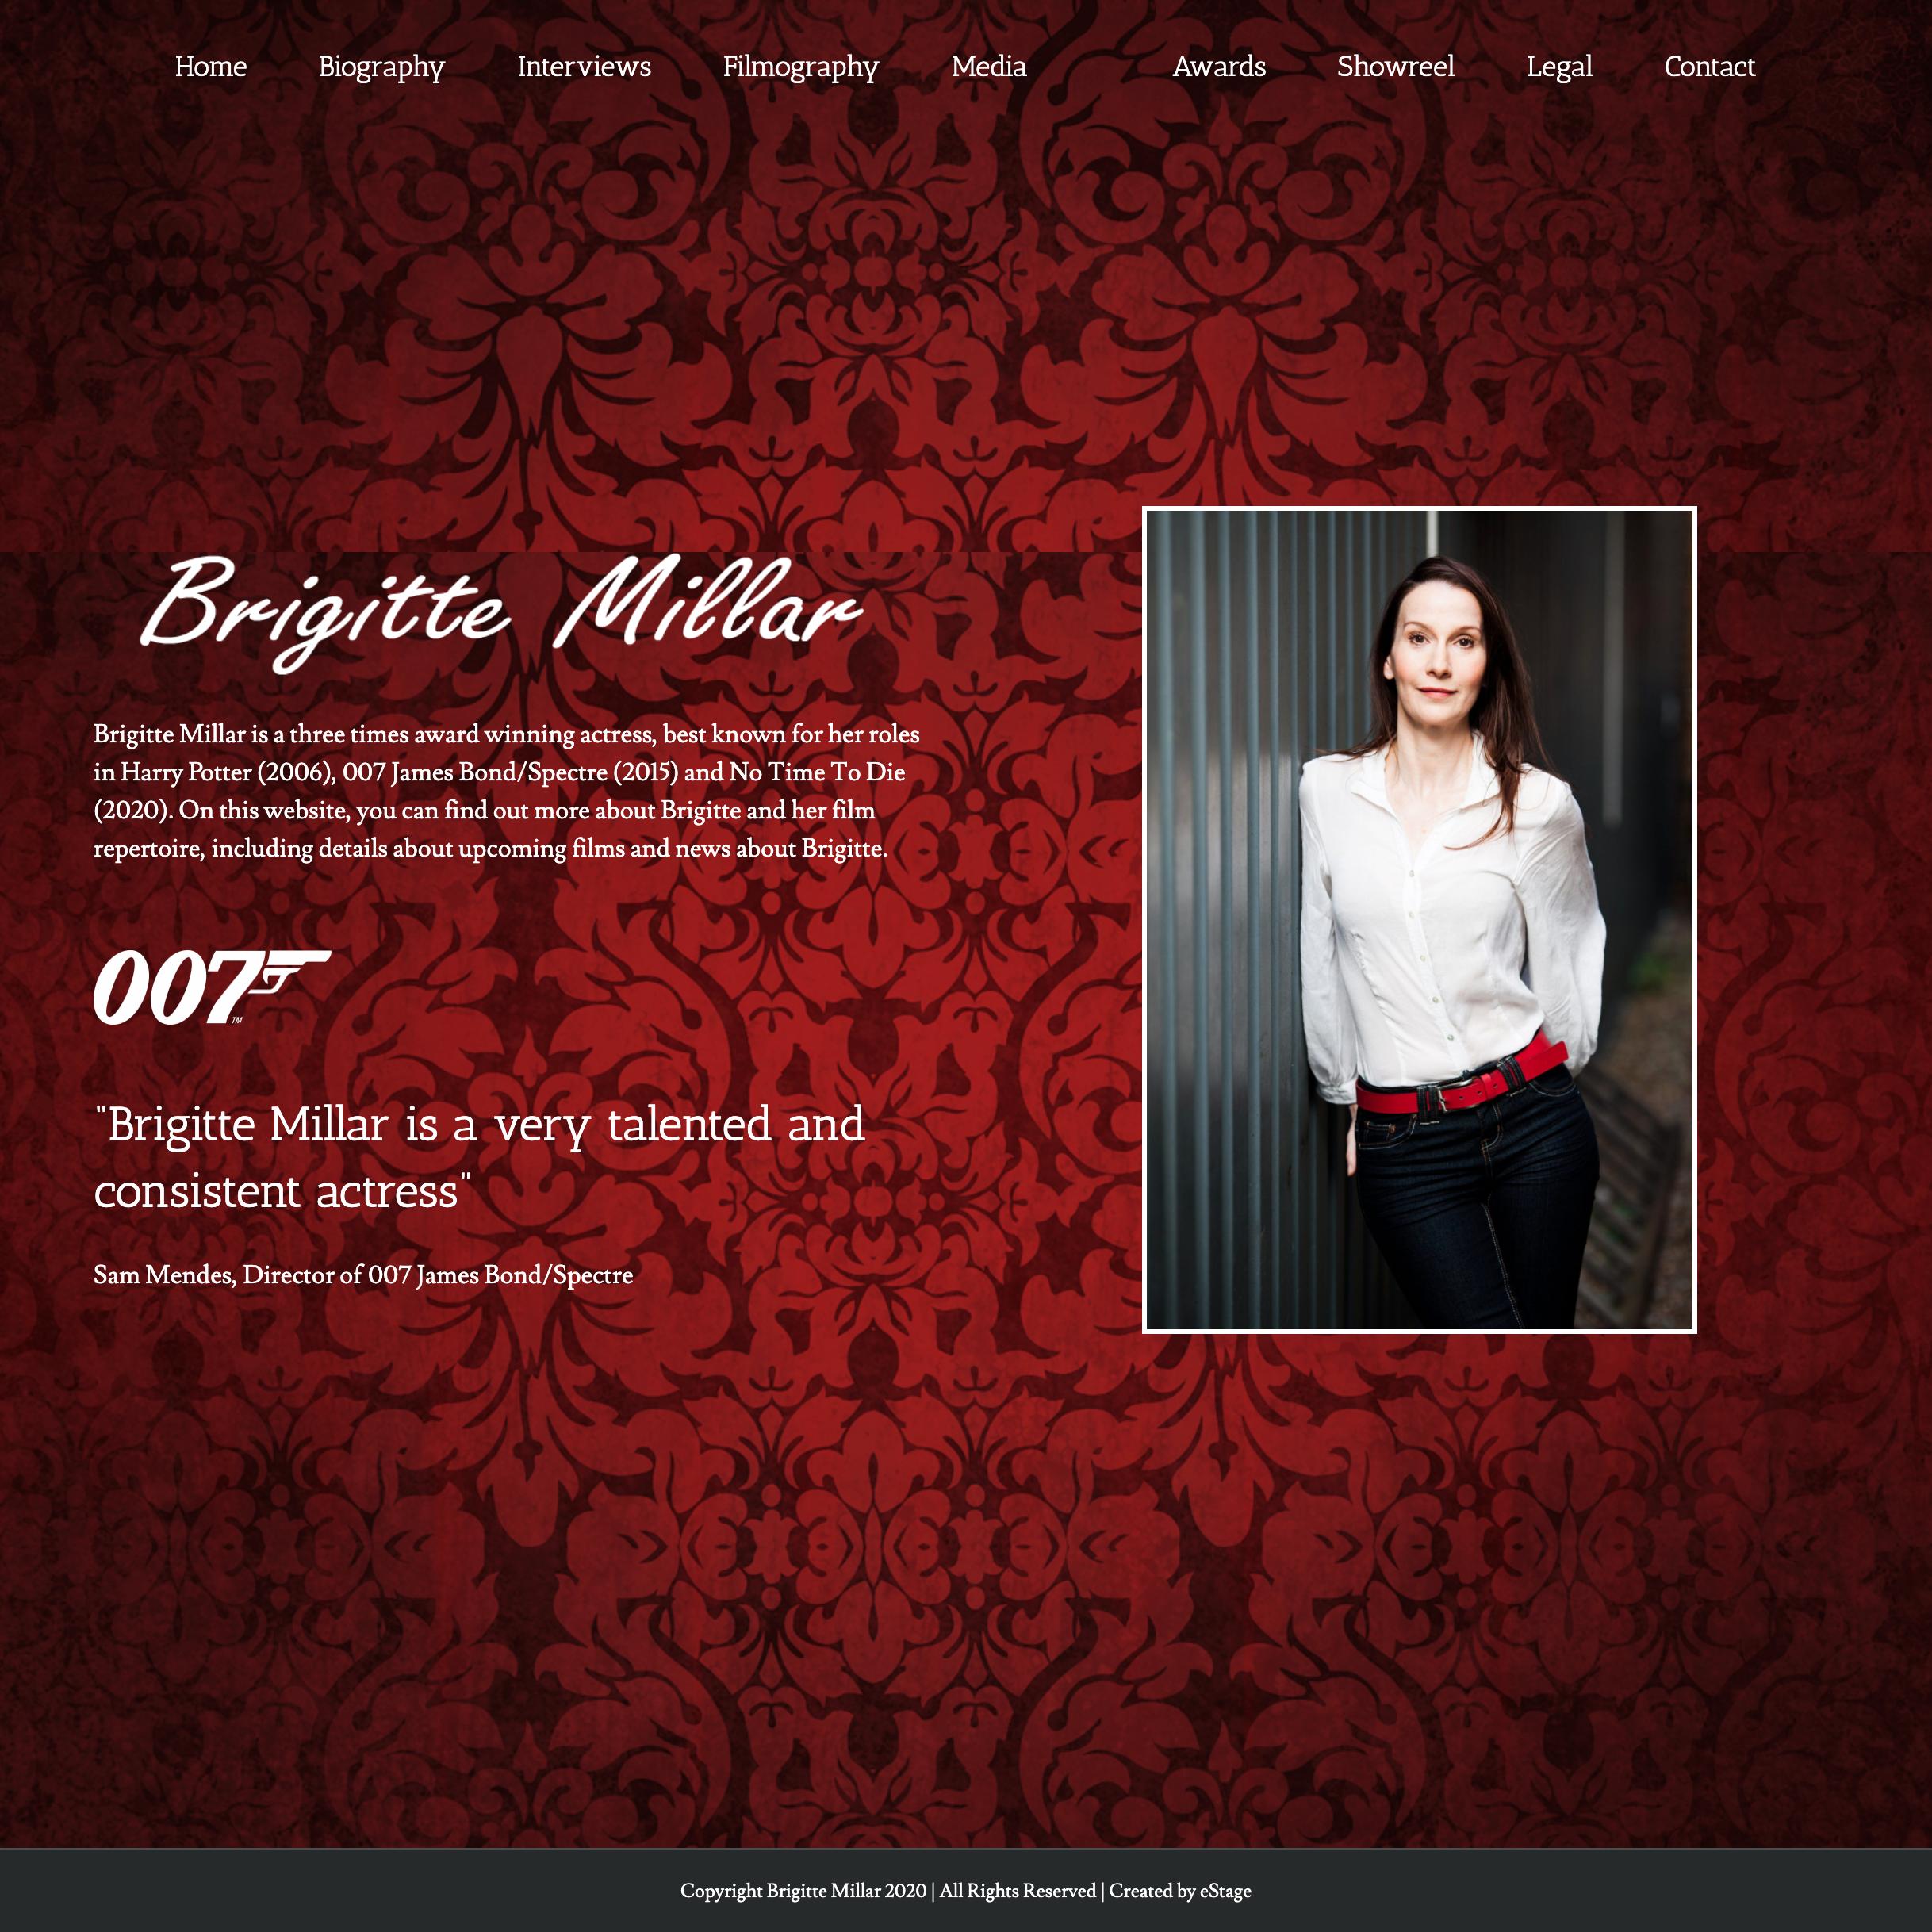 screencapture-brigittemillar-2020-12-22-19_19_47